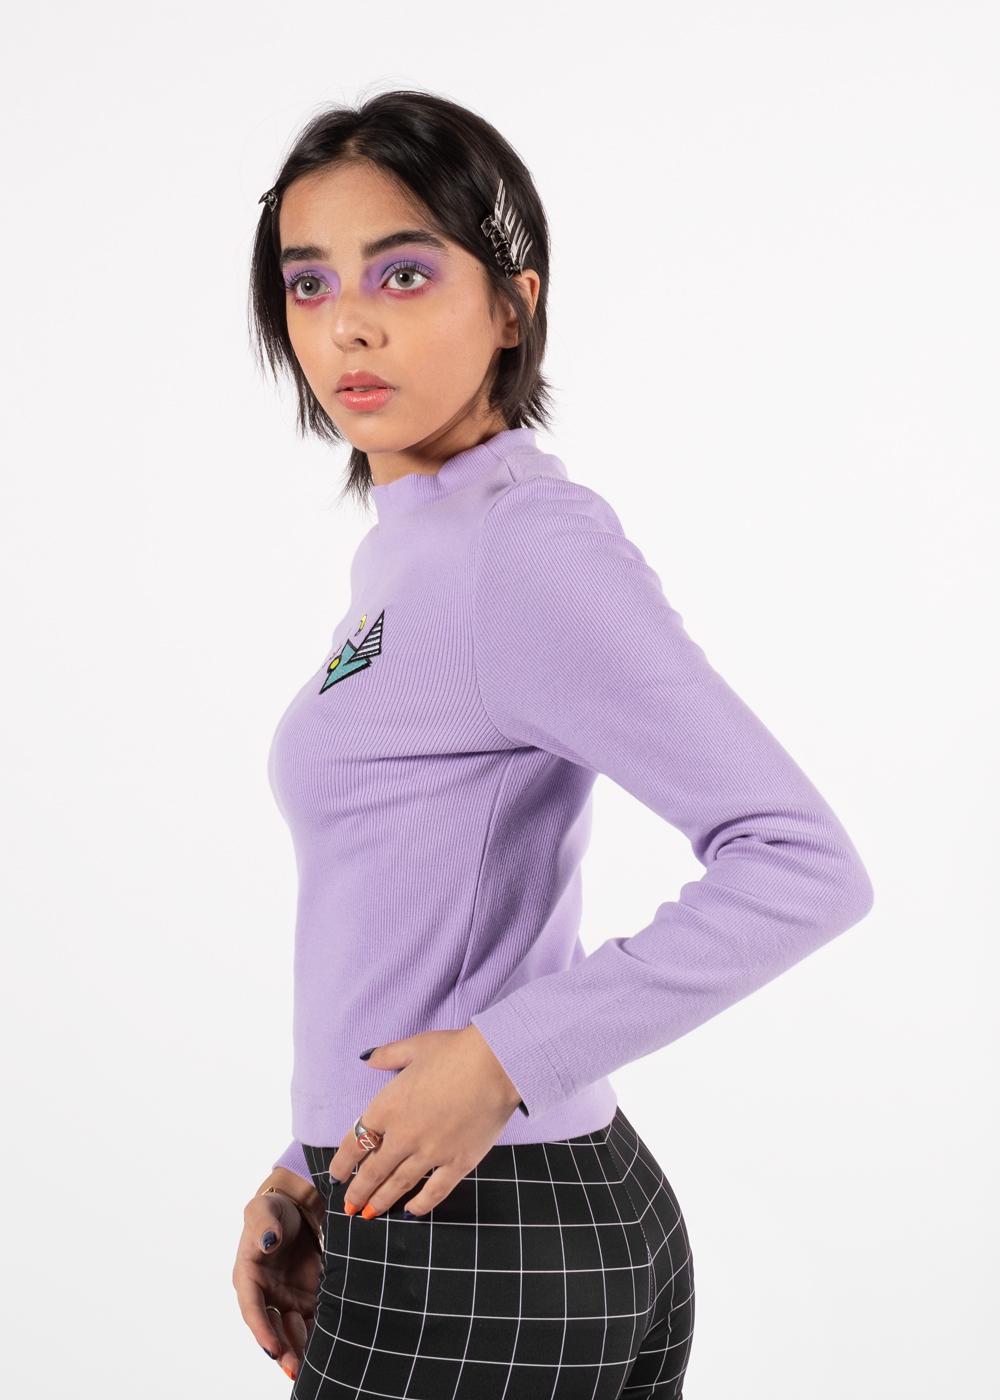 PurpleTop2